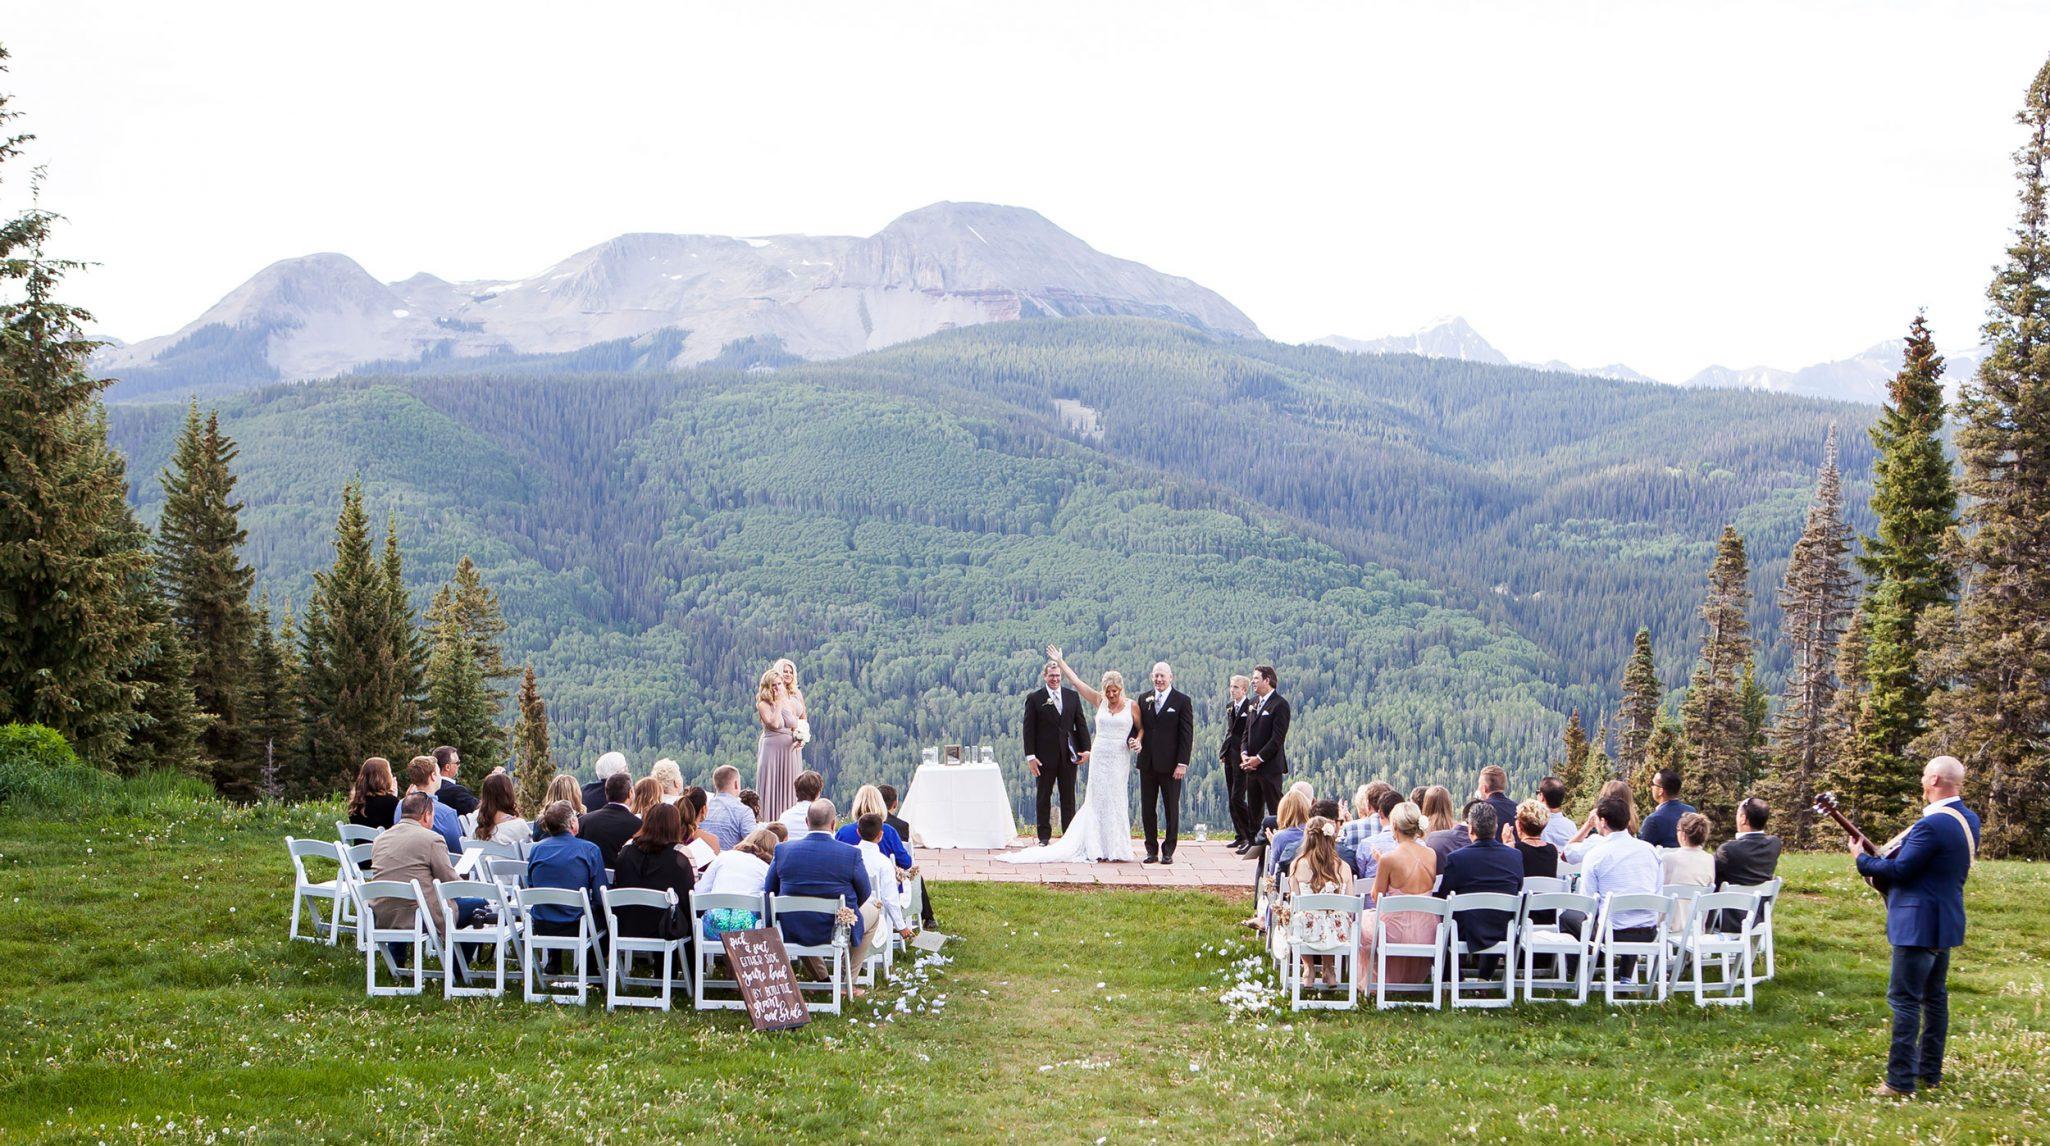 Mountaintop ceremony at Purgatory Resort, Durango CO